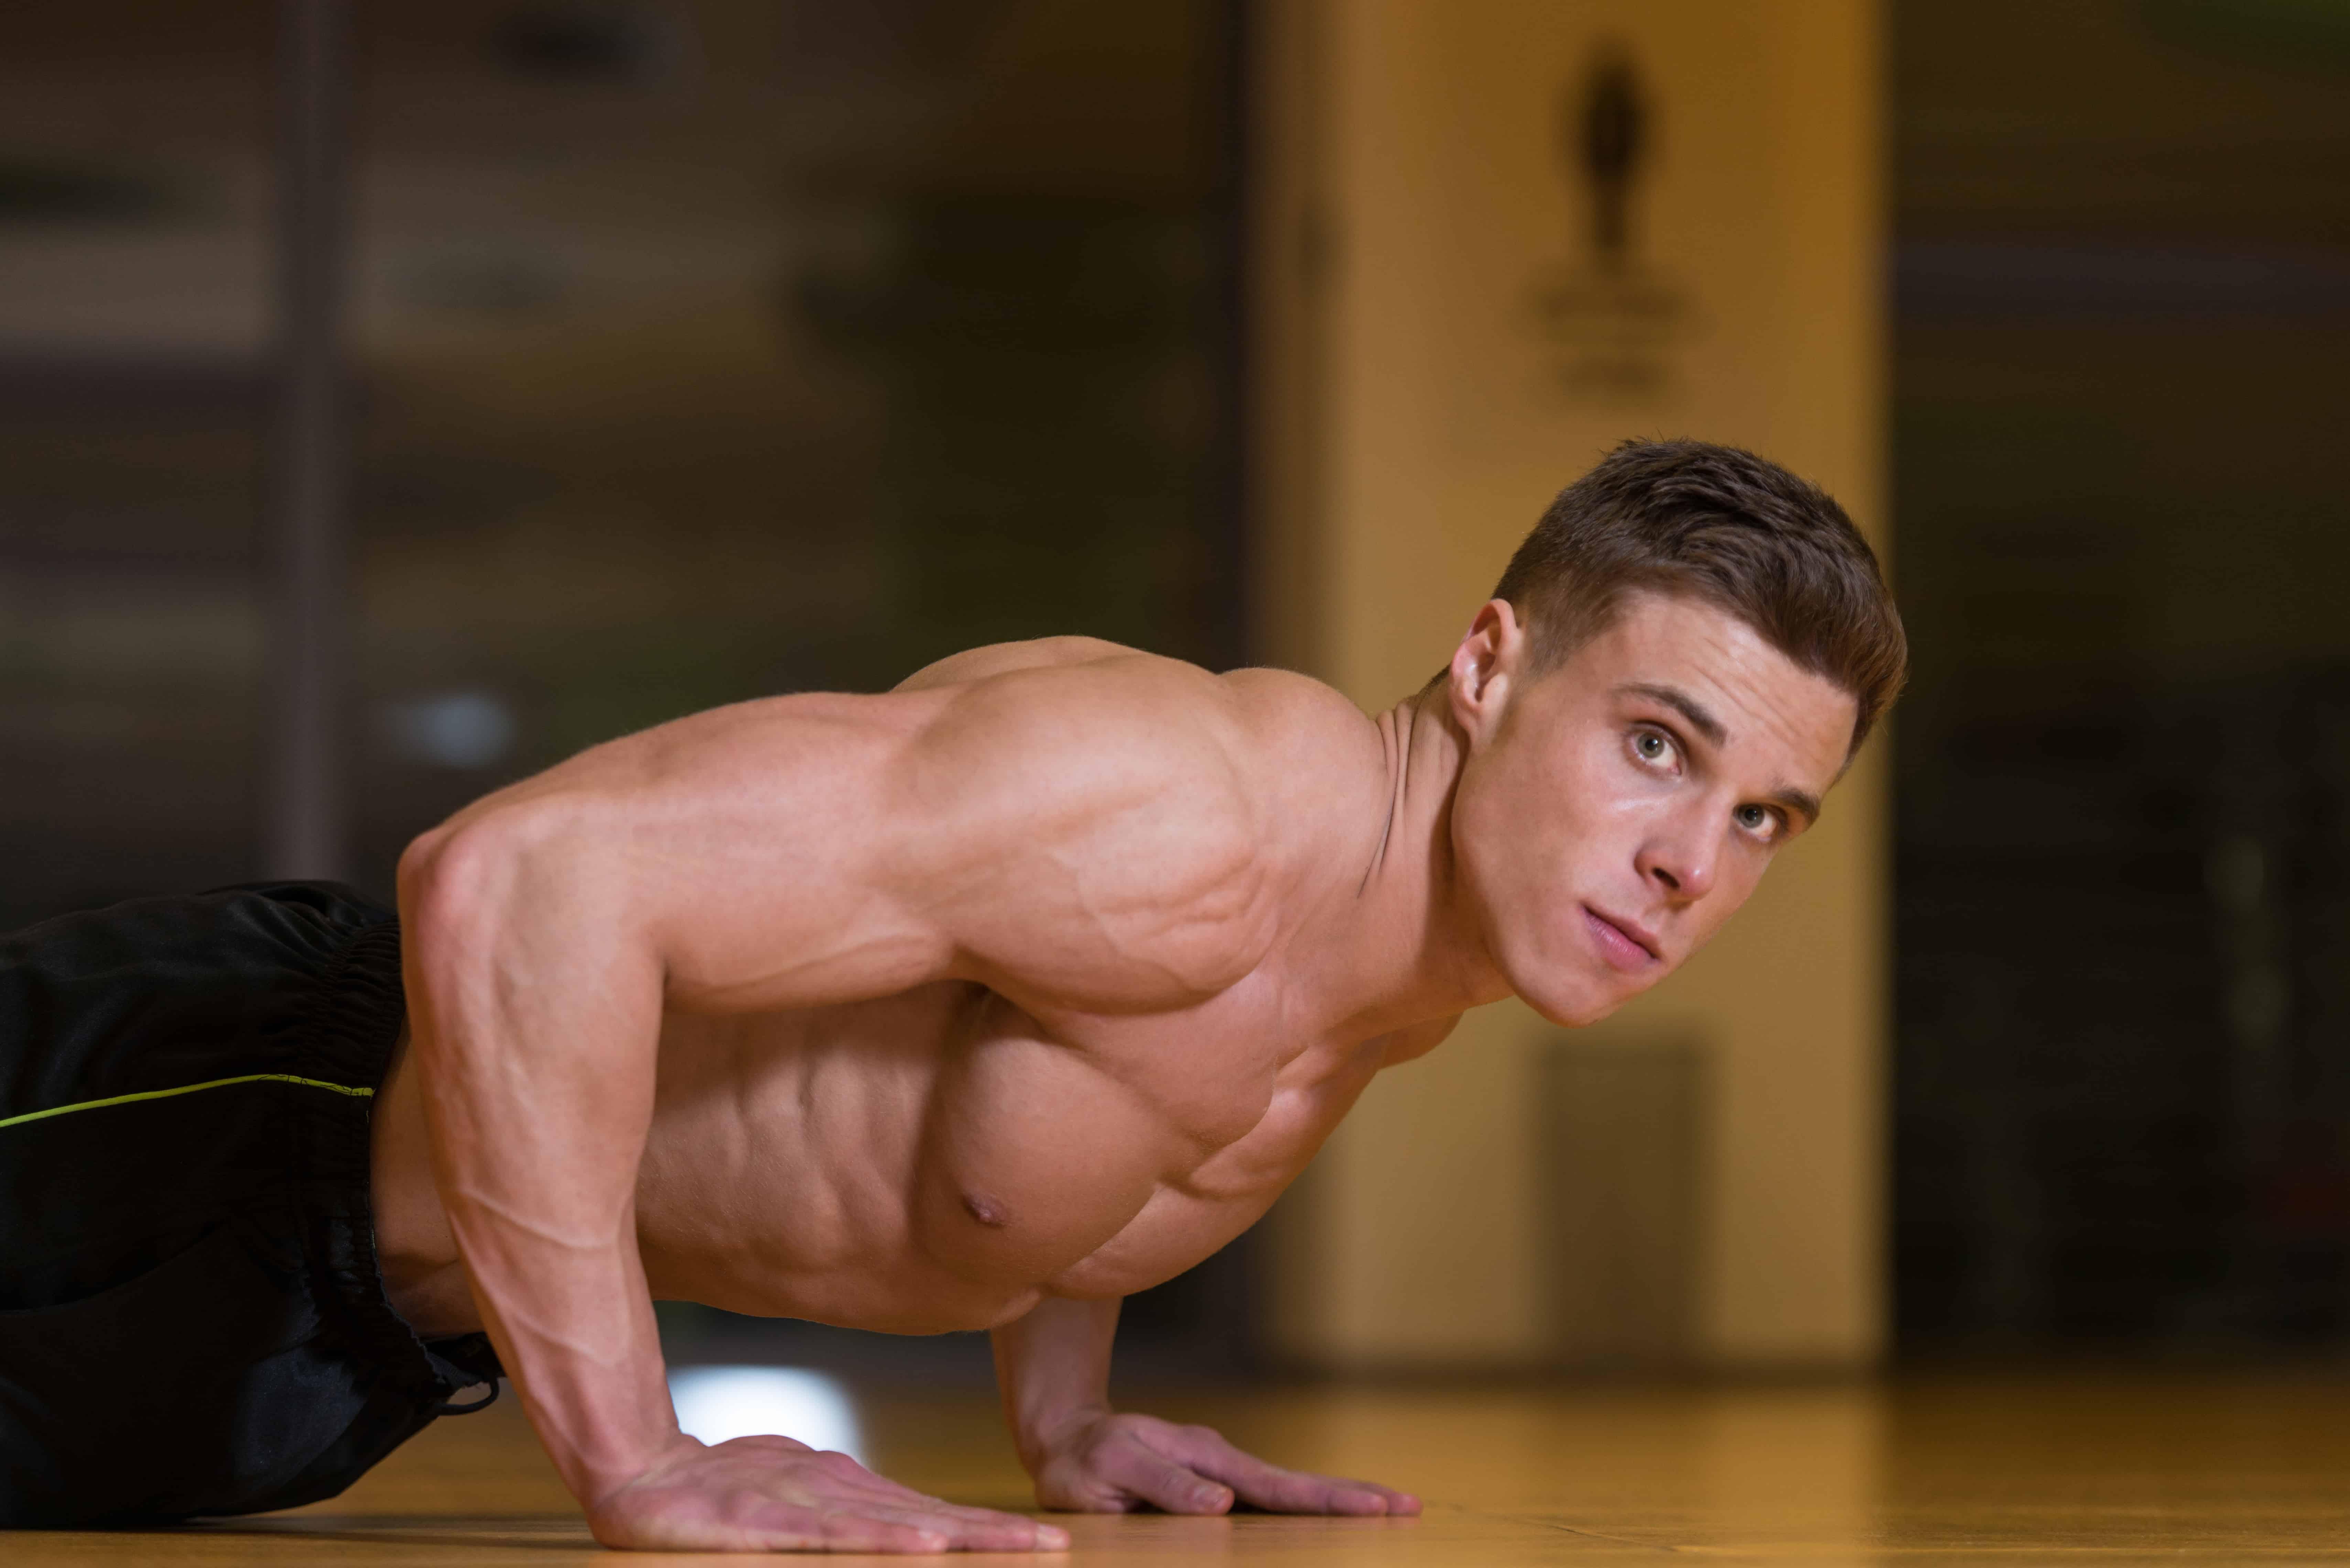 Bodyweight training tips to follow